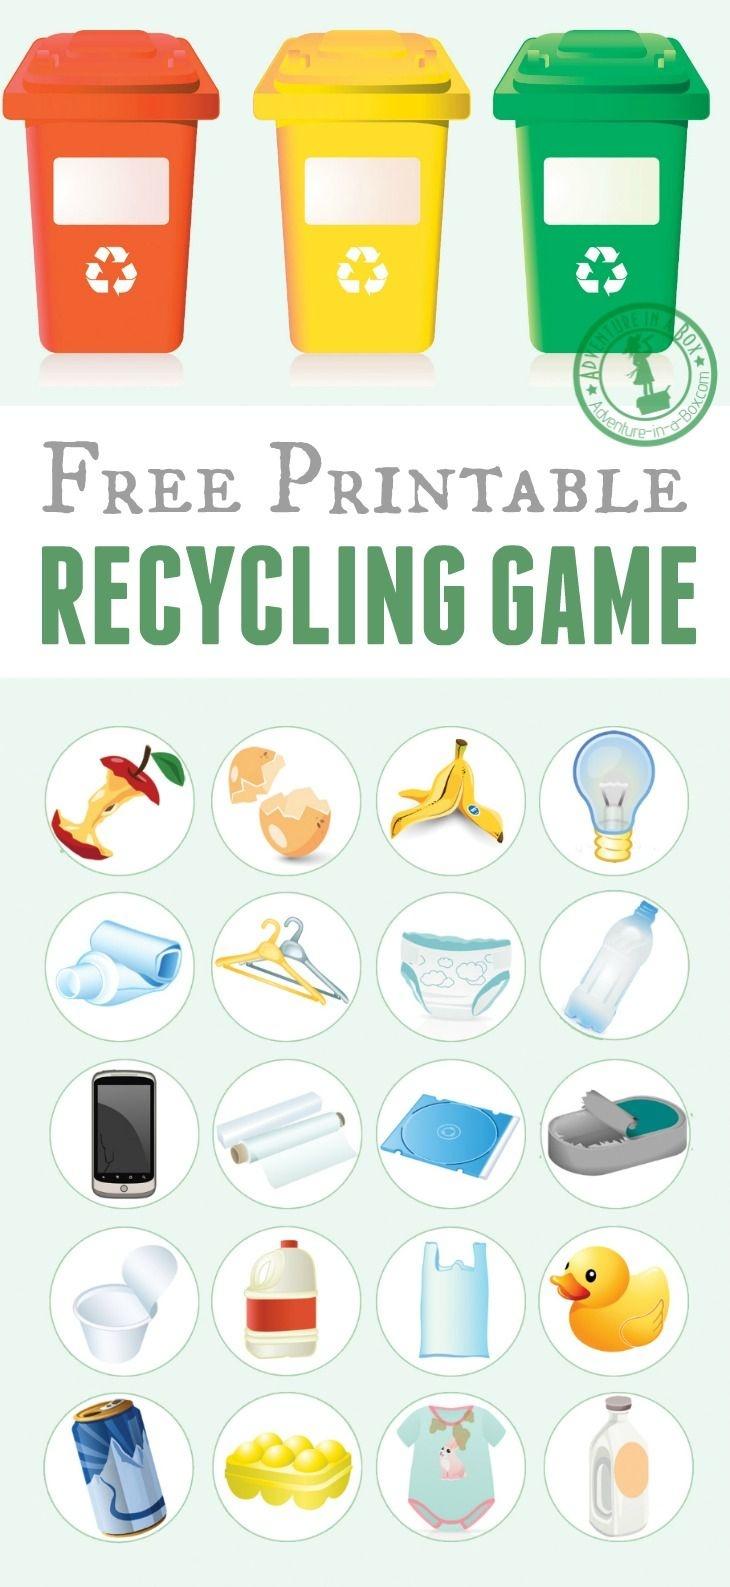 Printable Recycling Game   Free Printable Of The Day   Recycling - Free Printable Recycling Worksheets